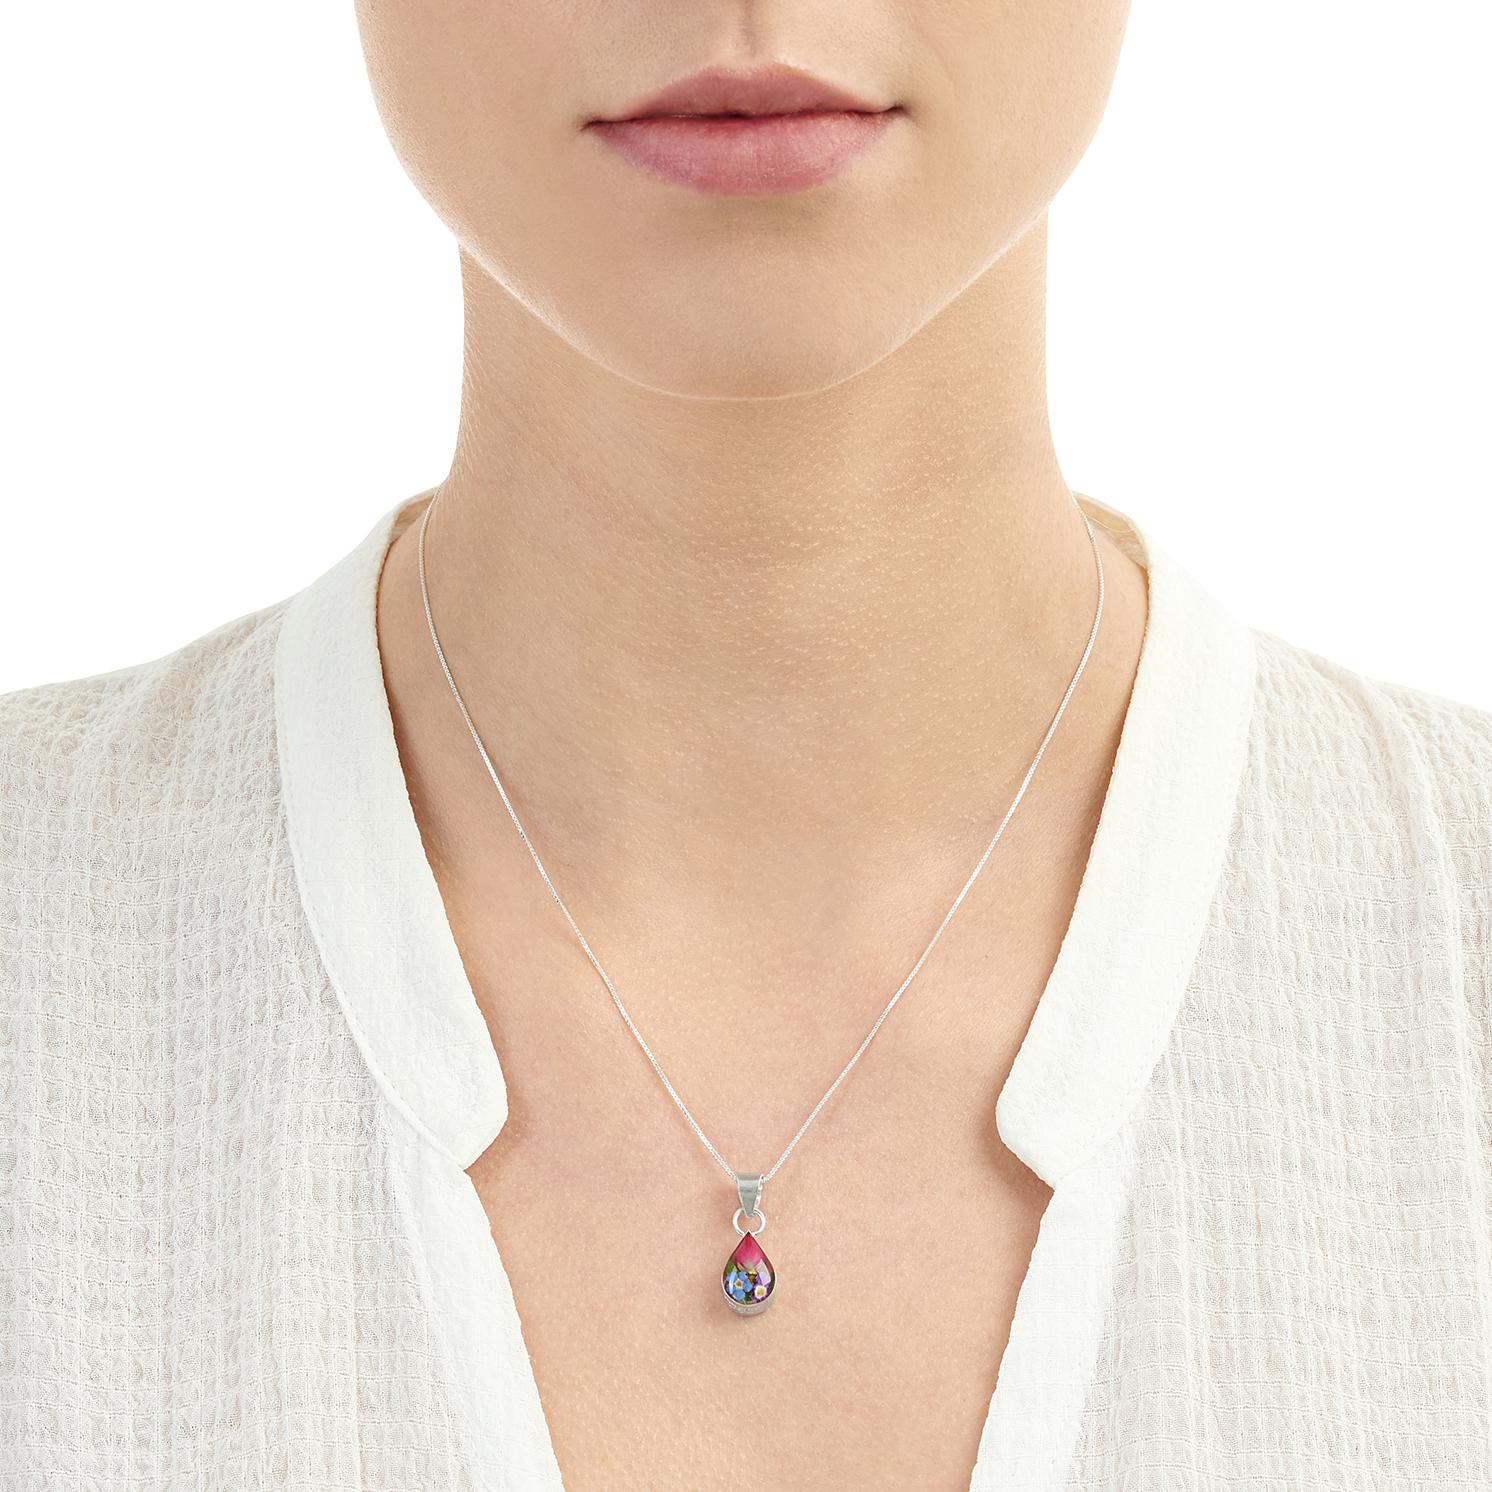 Shrieking Violet – Mixed Flowers Silver Small Teardrop Pendant Necklace in Box